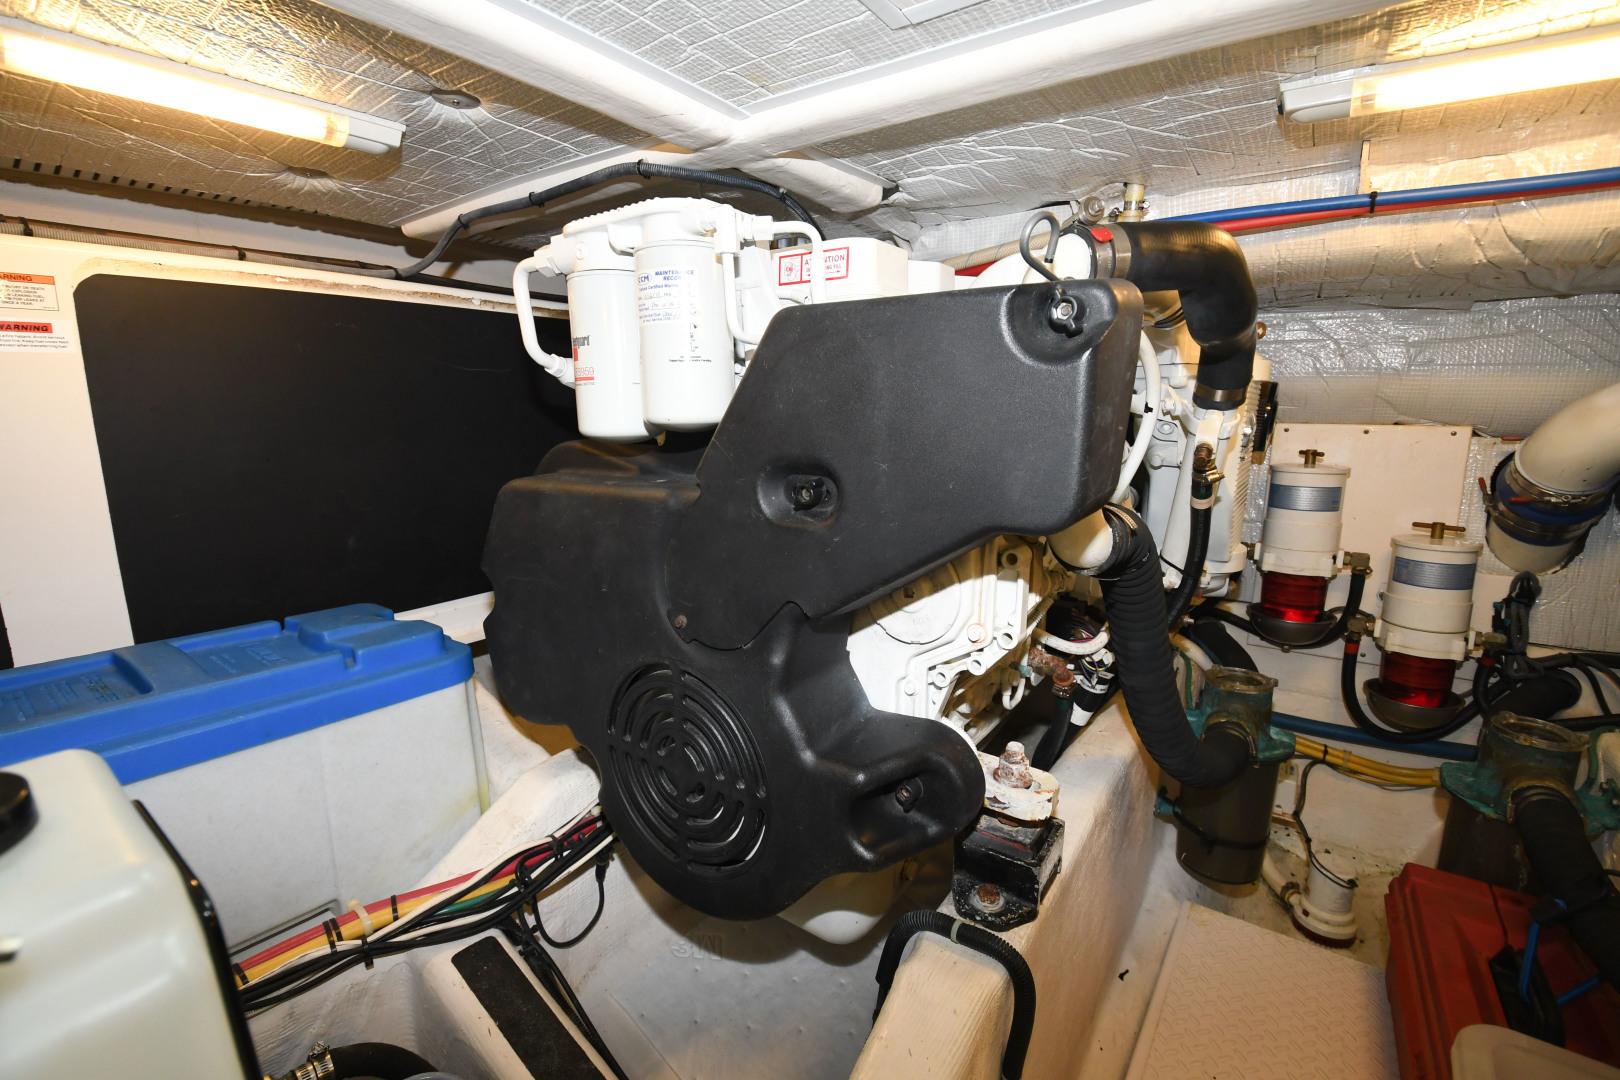 Sabre-40 Express 2010-Impulse Treasure Island-Florida-United States-2010 40 Sabre Express  Impulse  Engine Room-1618646 | Thumbnail